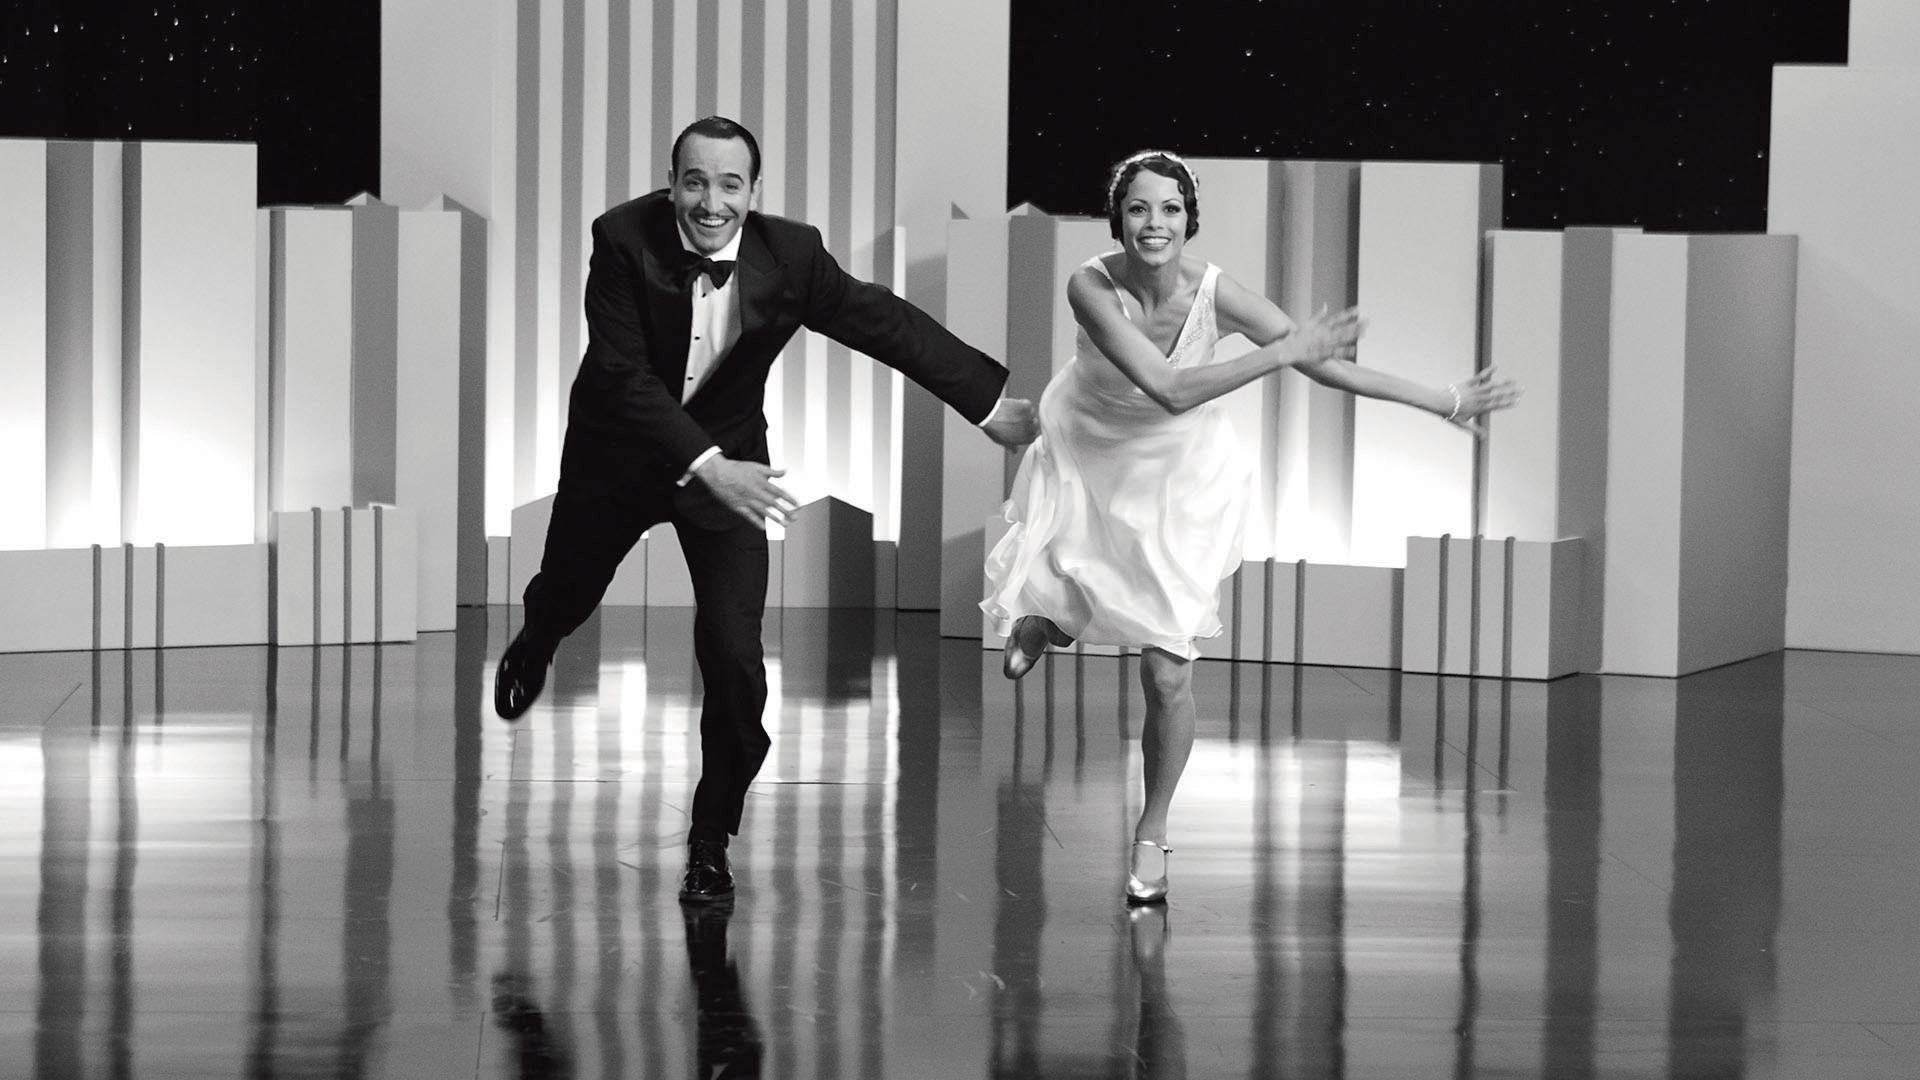 Oscar 2012 Composite Winner Predictions